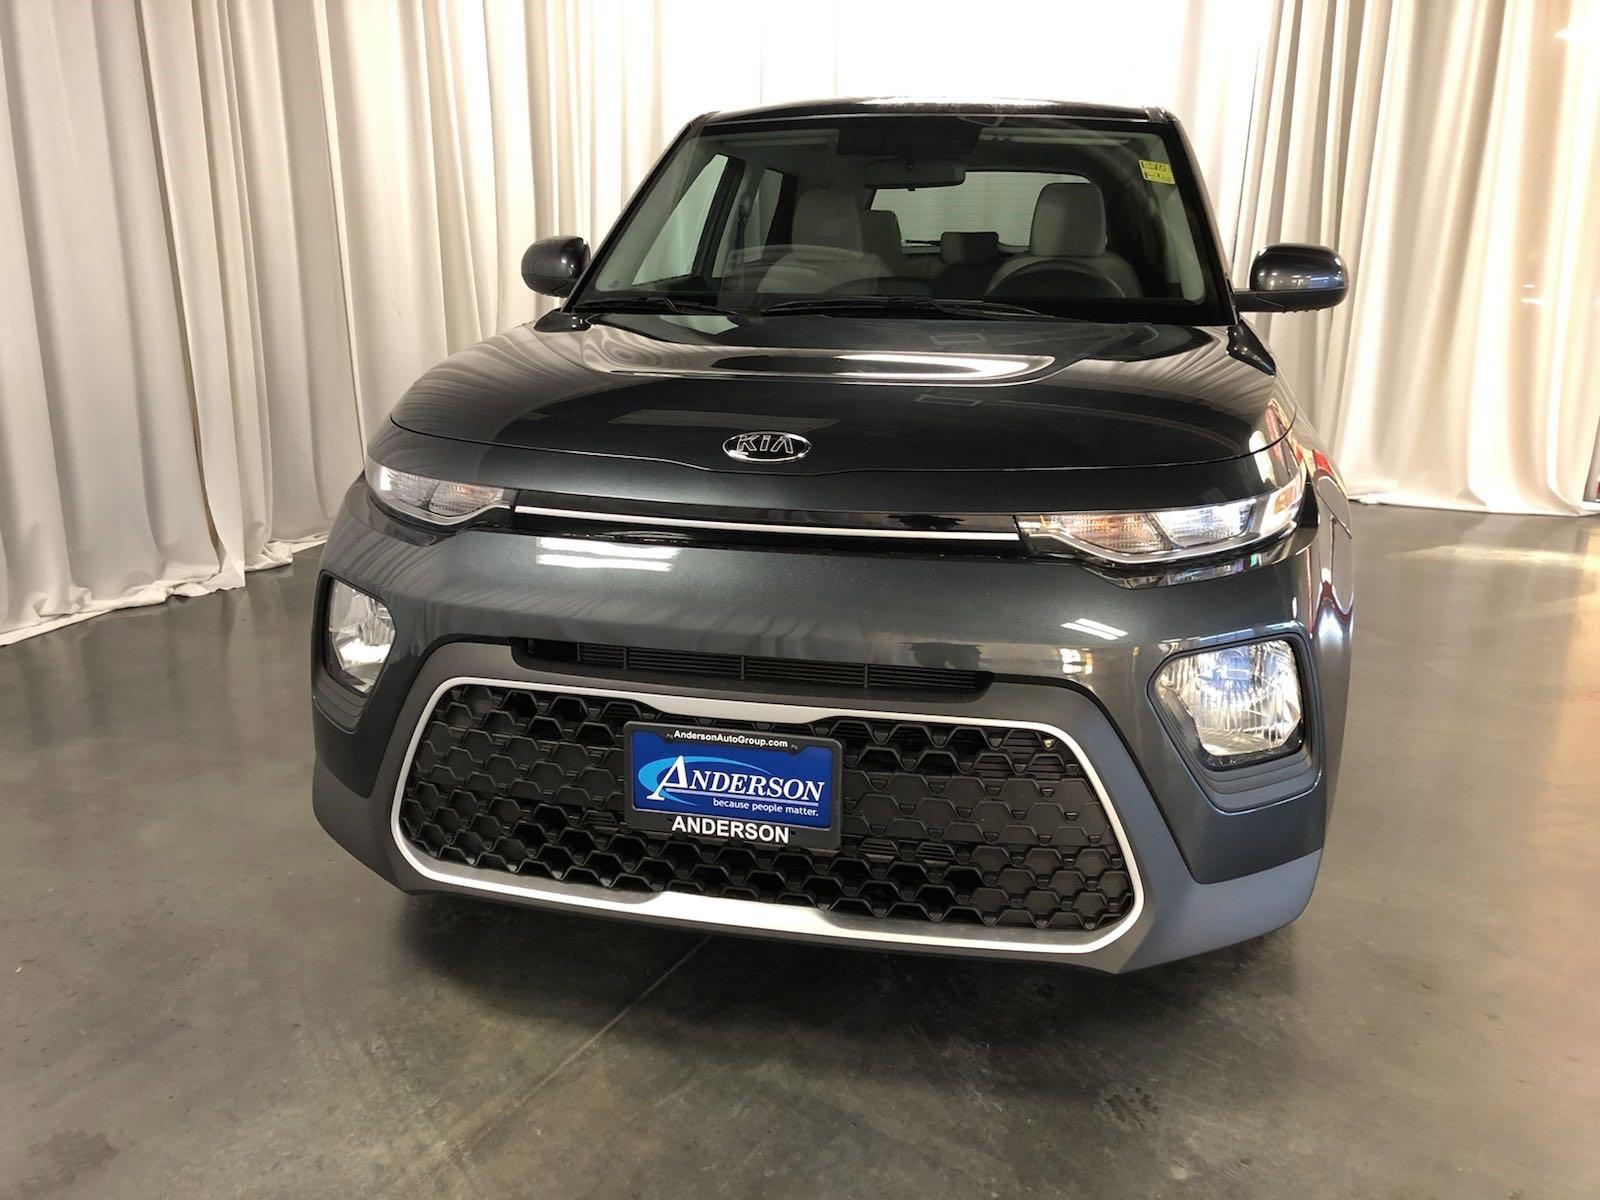 New 2020 Kia Soul LX Hatchback for sale in St Joseph MO